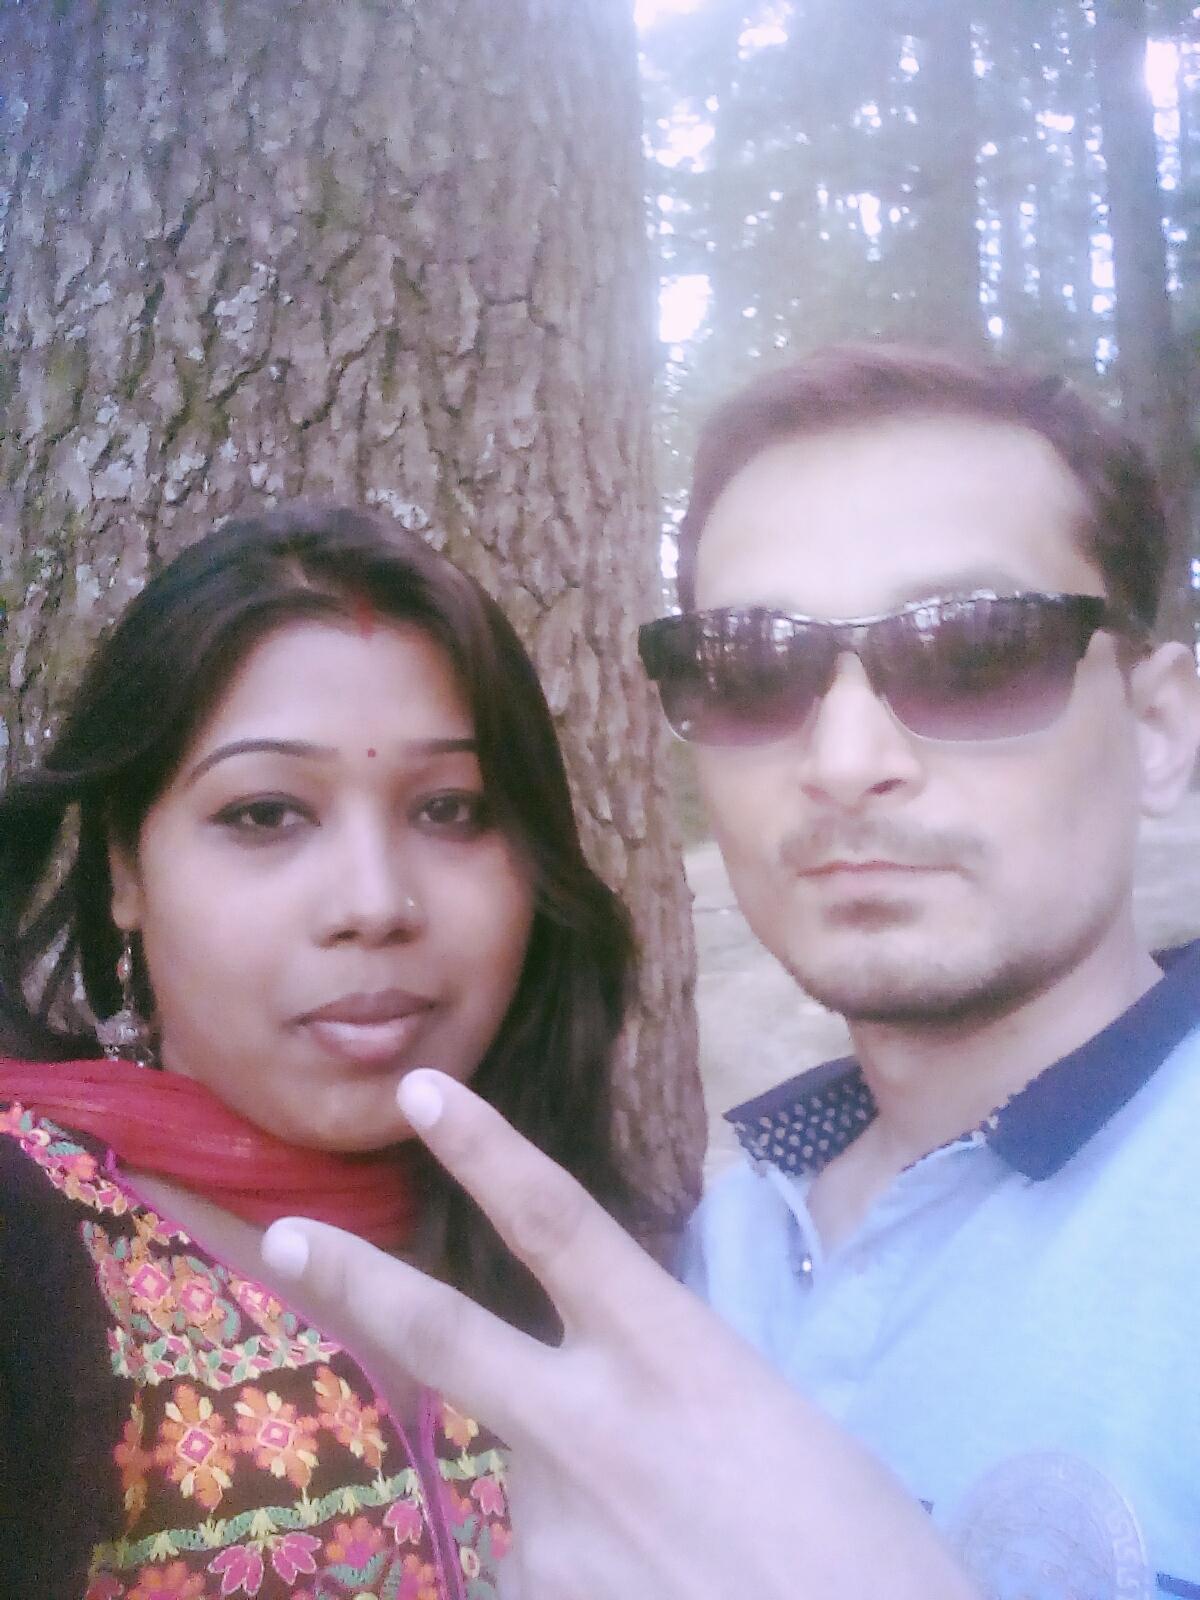 Van Vihar manali places to visit